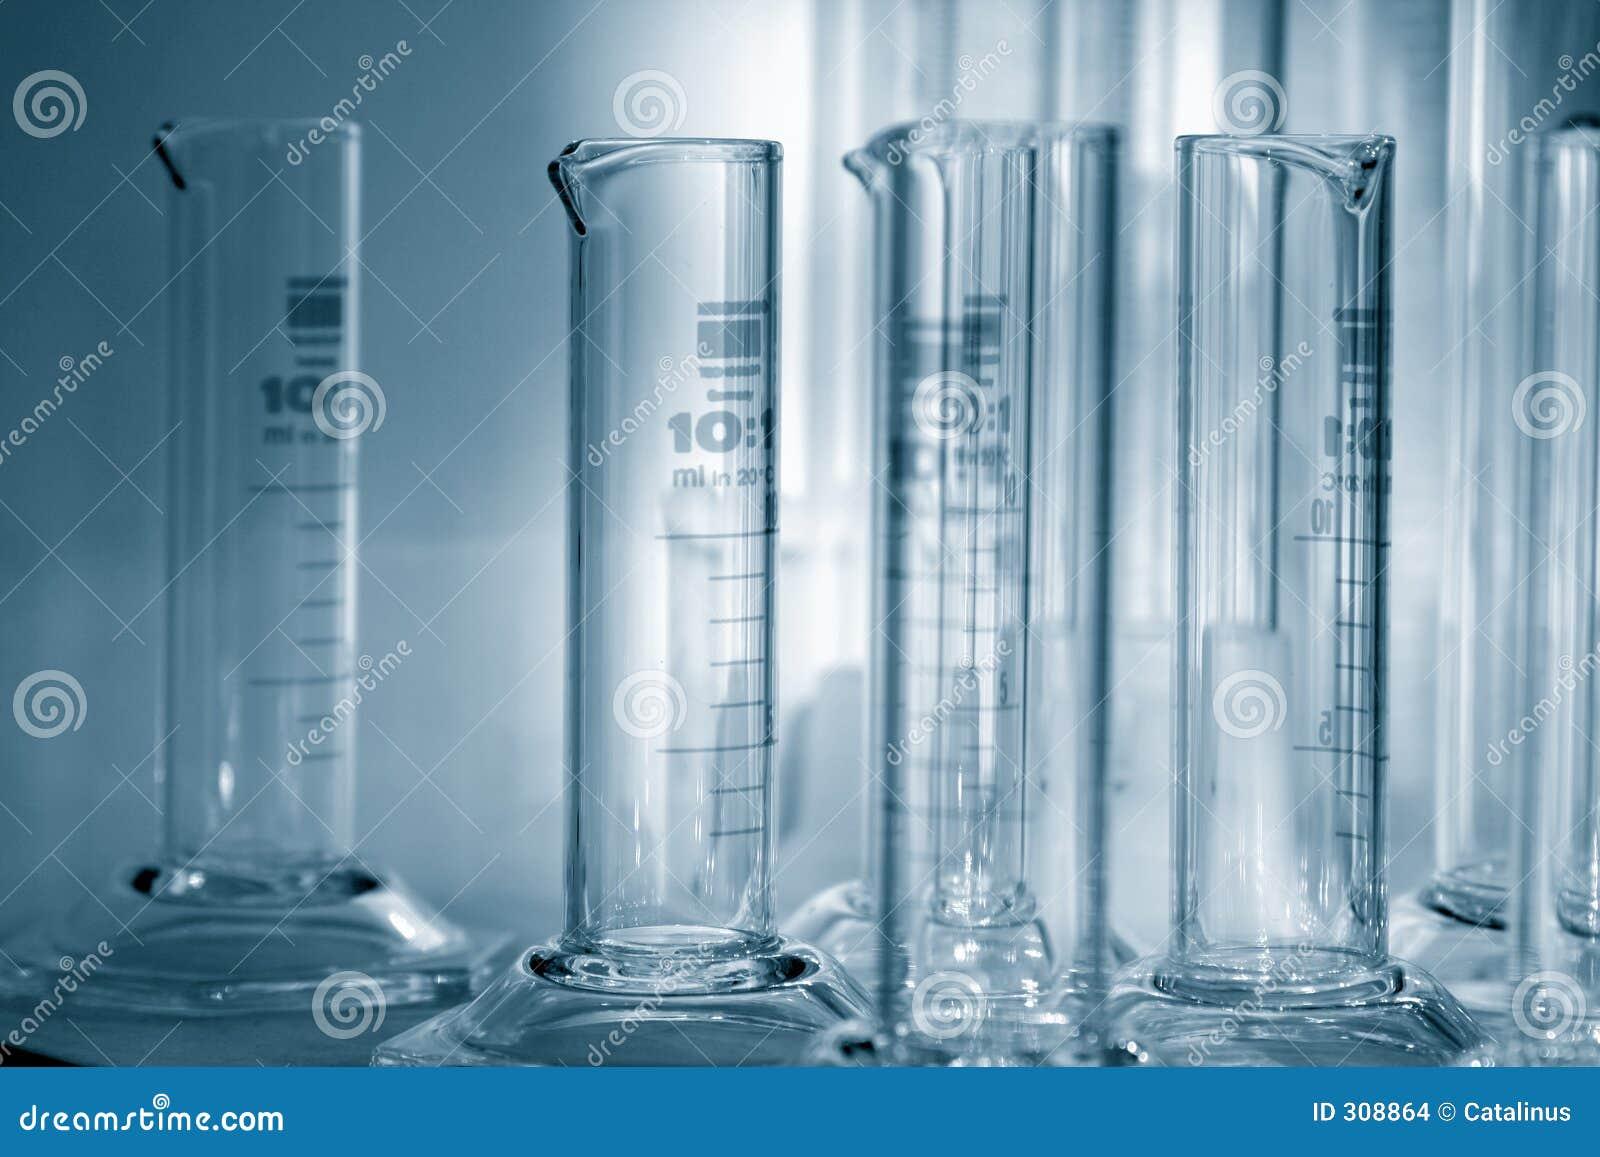 1 cilinders毕业的科学